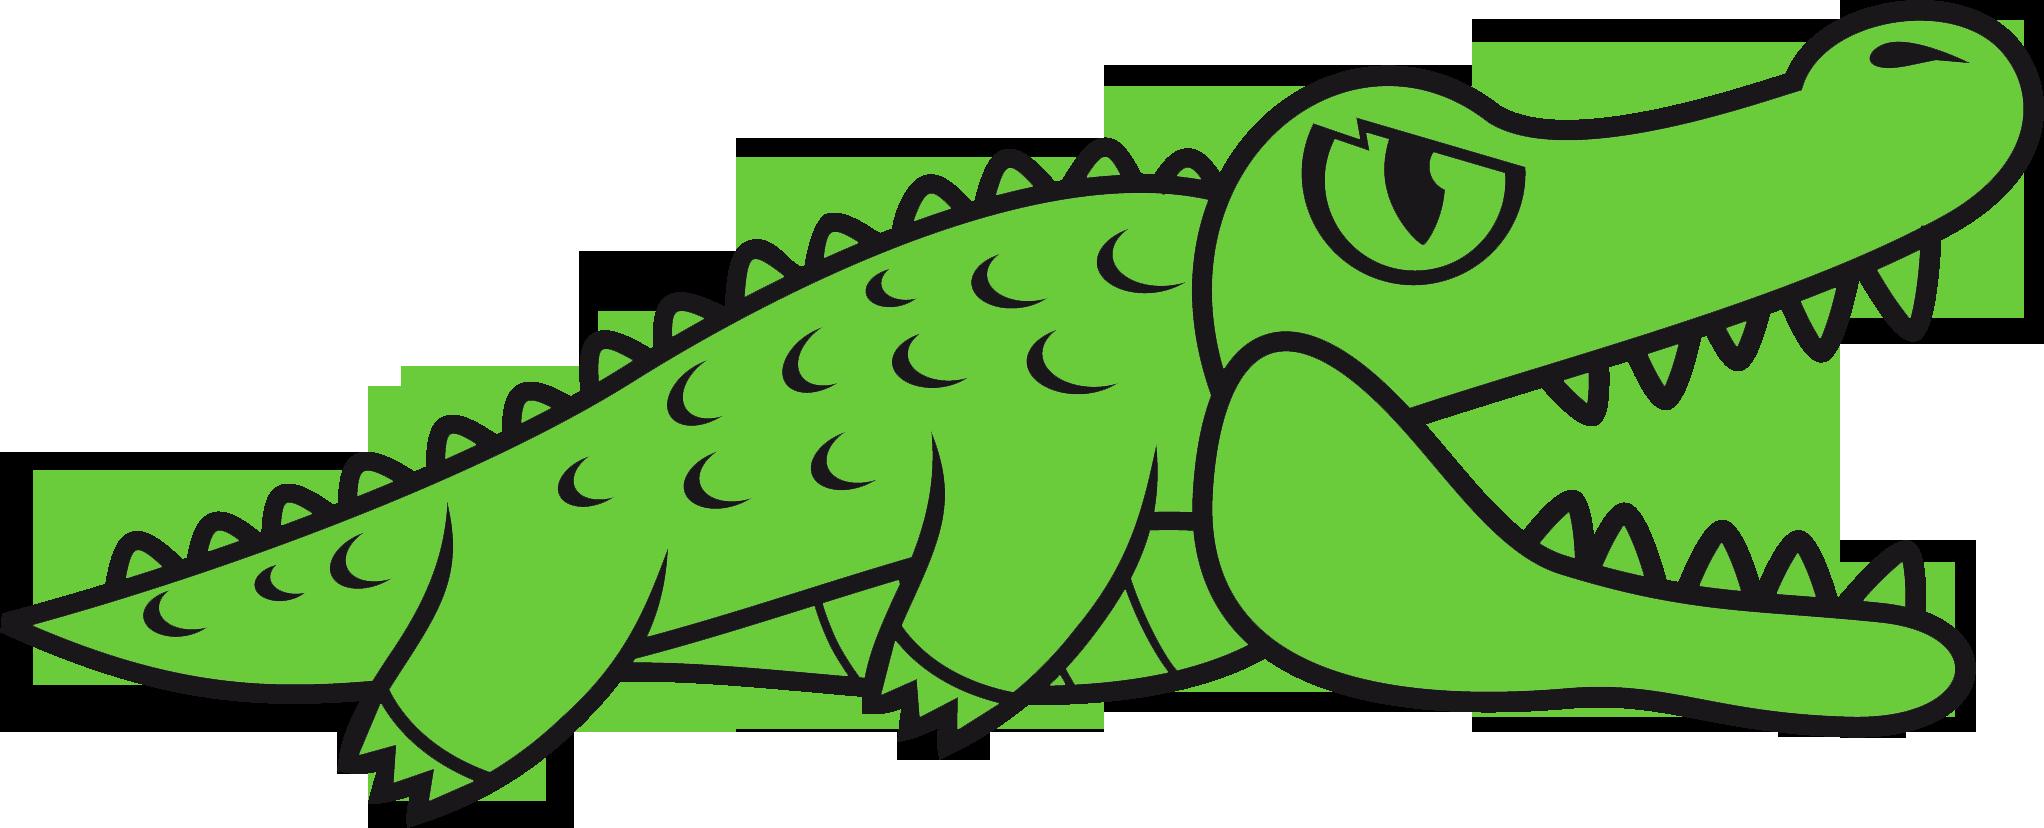 Cute alligator outline